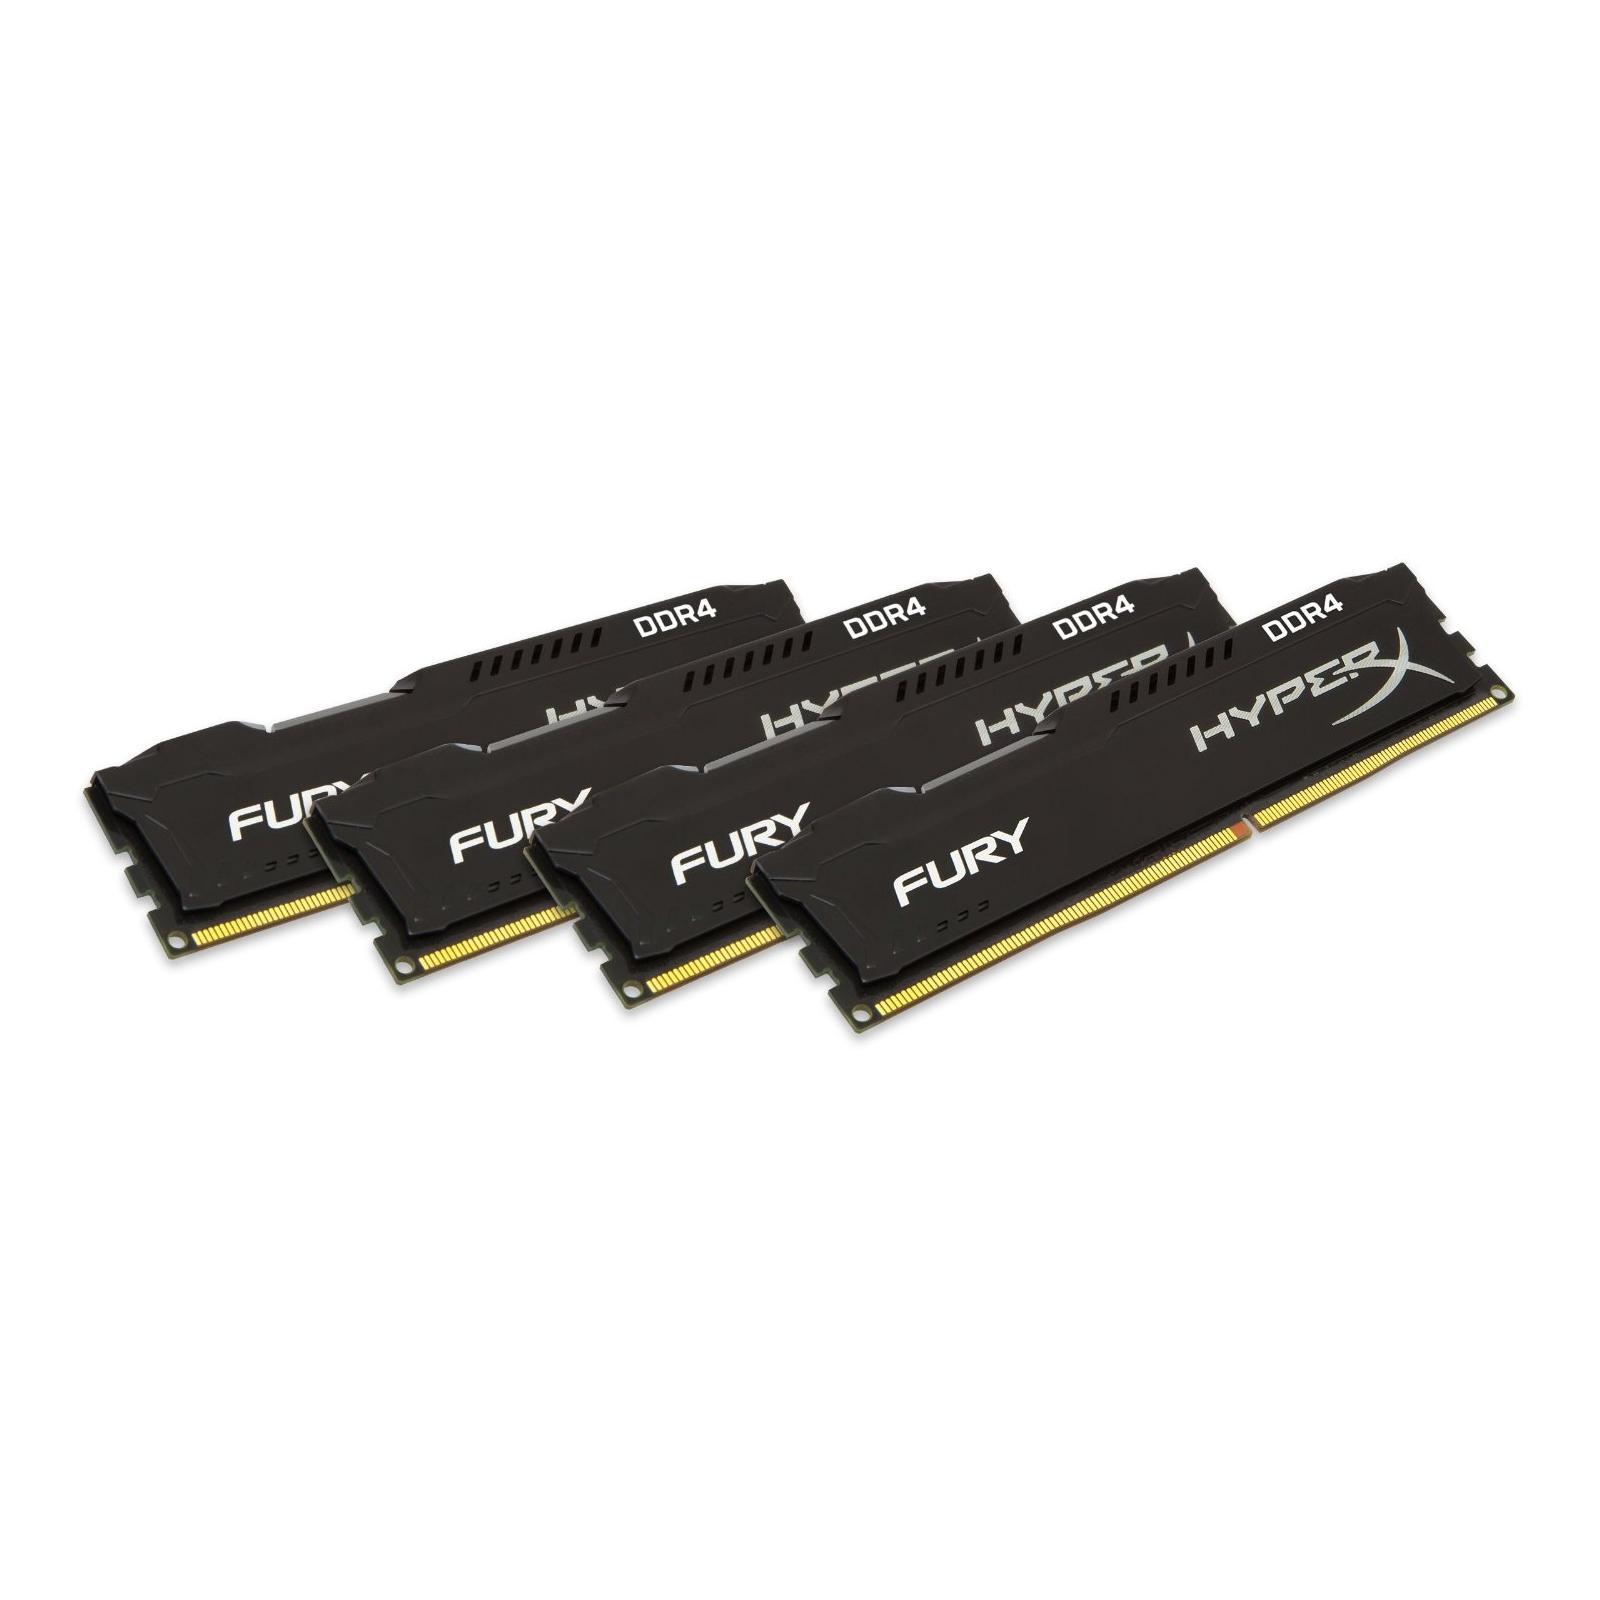 Модуль памяти для компьютера DDR4 64GB (4x16GB) 2133 MHz HyperX FURY Black Kingston (HX421C14FBK4/64) изображение 2